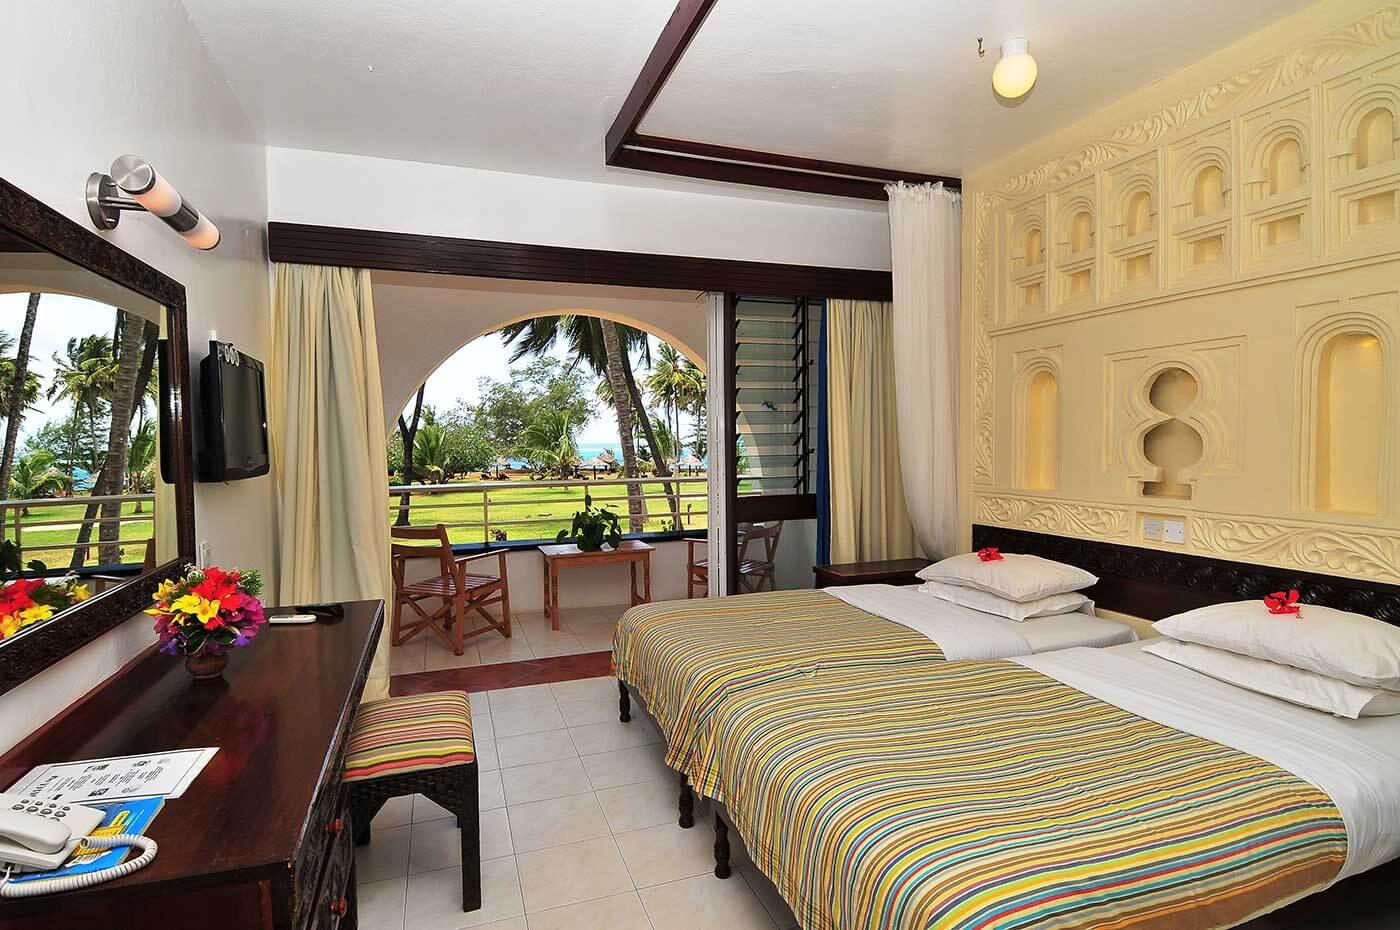 Reef hotel Mombasa 2